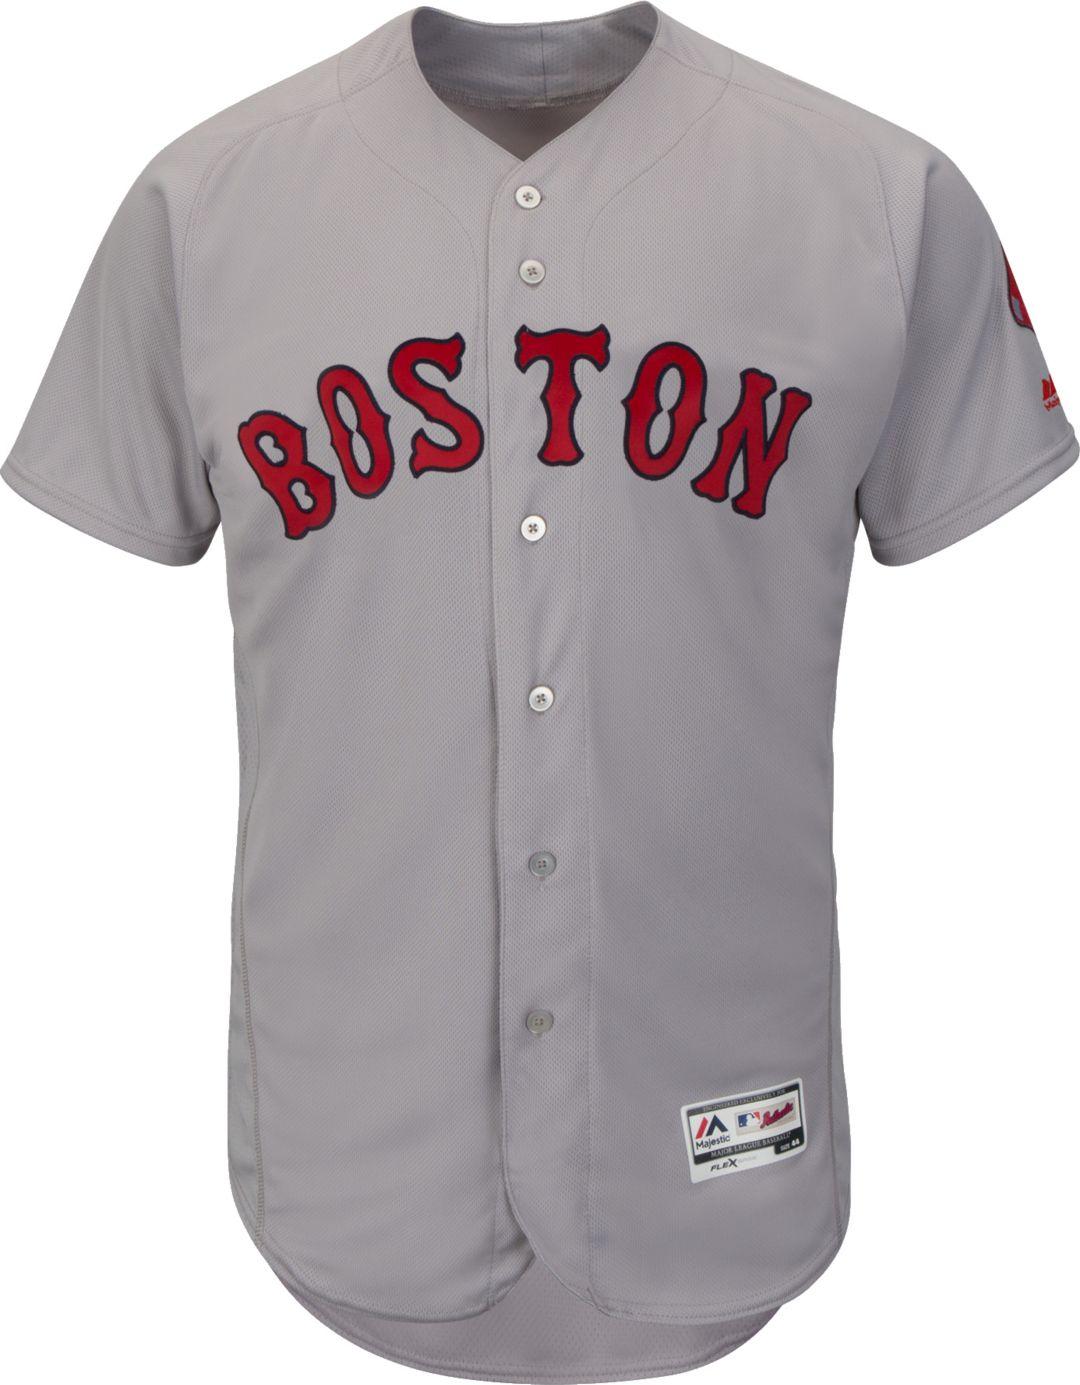 best service 17bd5 4c536 Majestic Men's Authentic Boston Red Sox Road Grey Flex Base On-Field Jersey